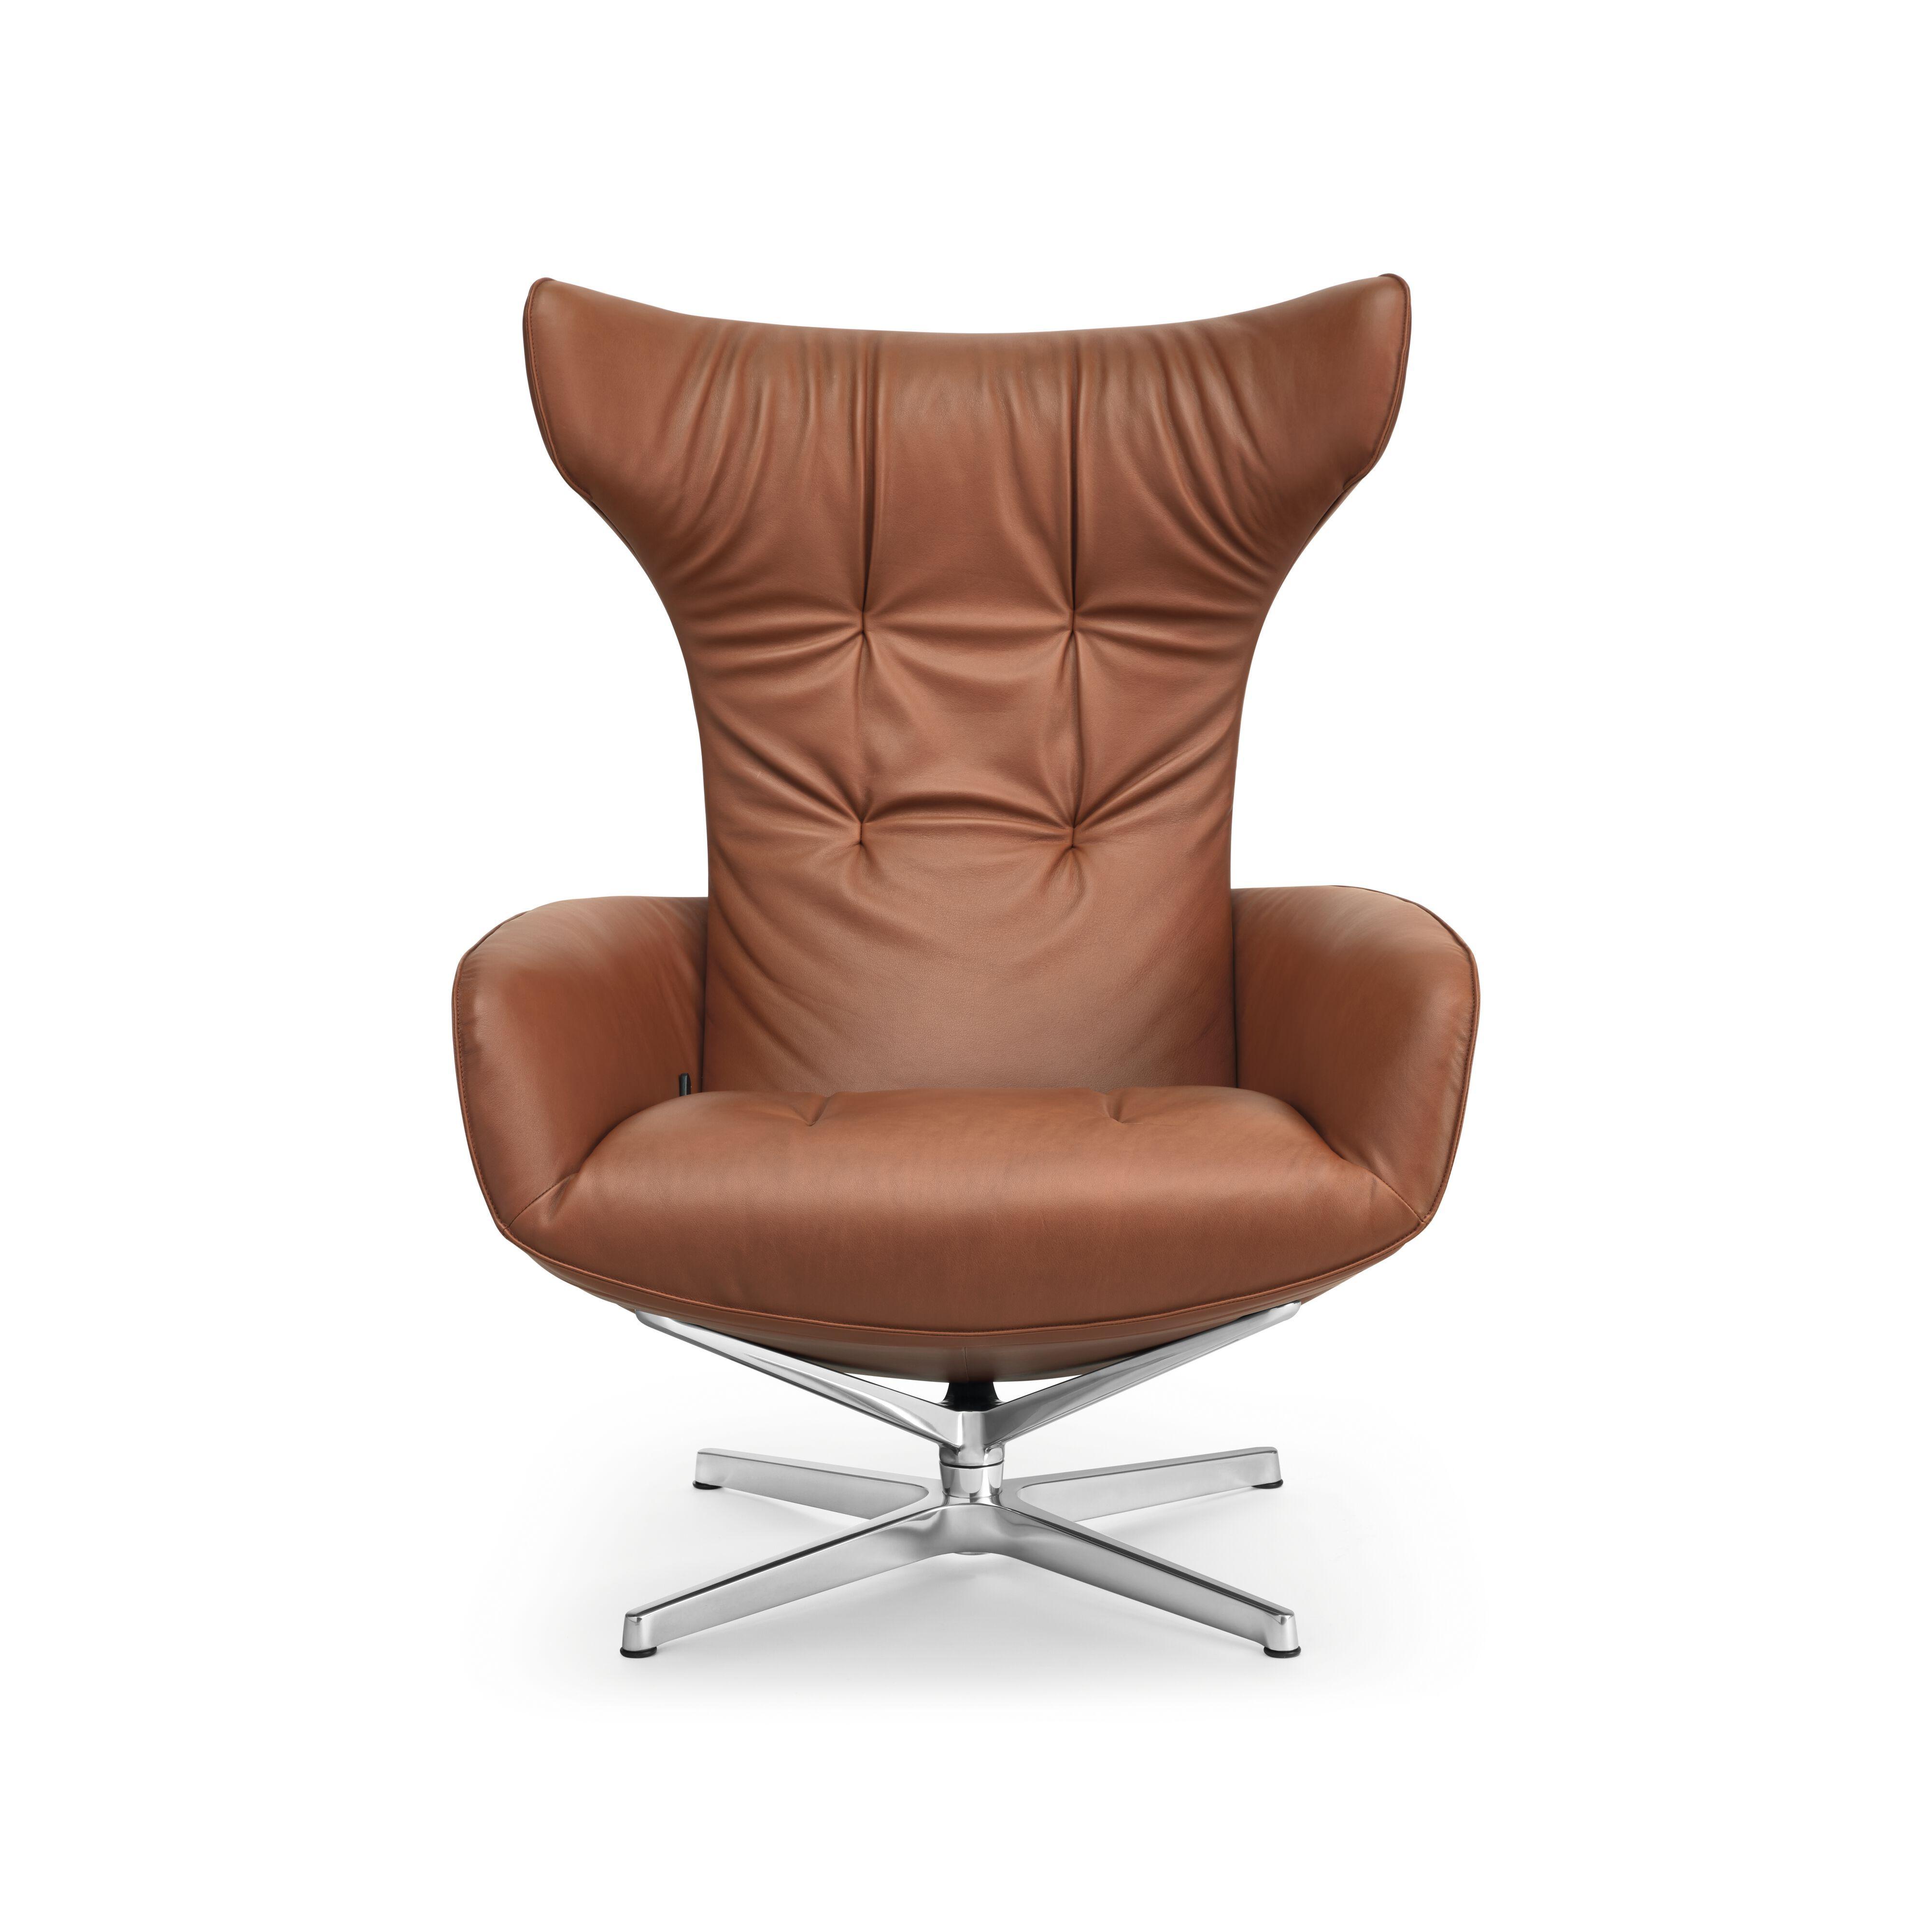 06-WK-Onsa Chair-hochglanzpoliert-0001-H.tif